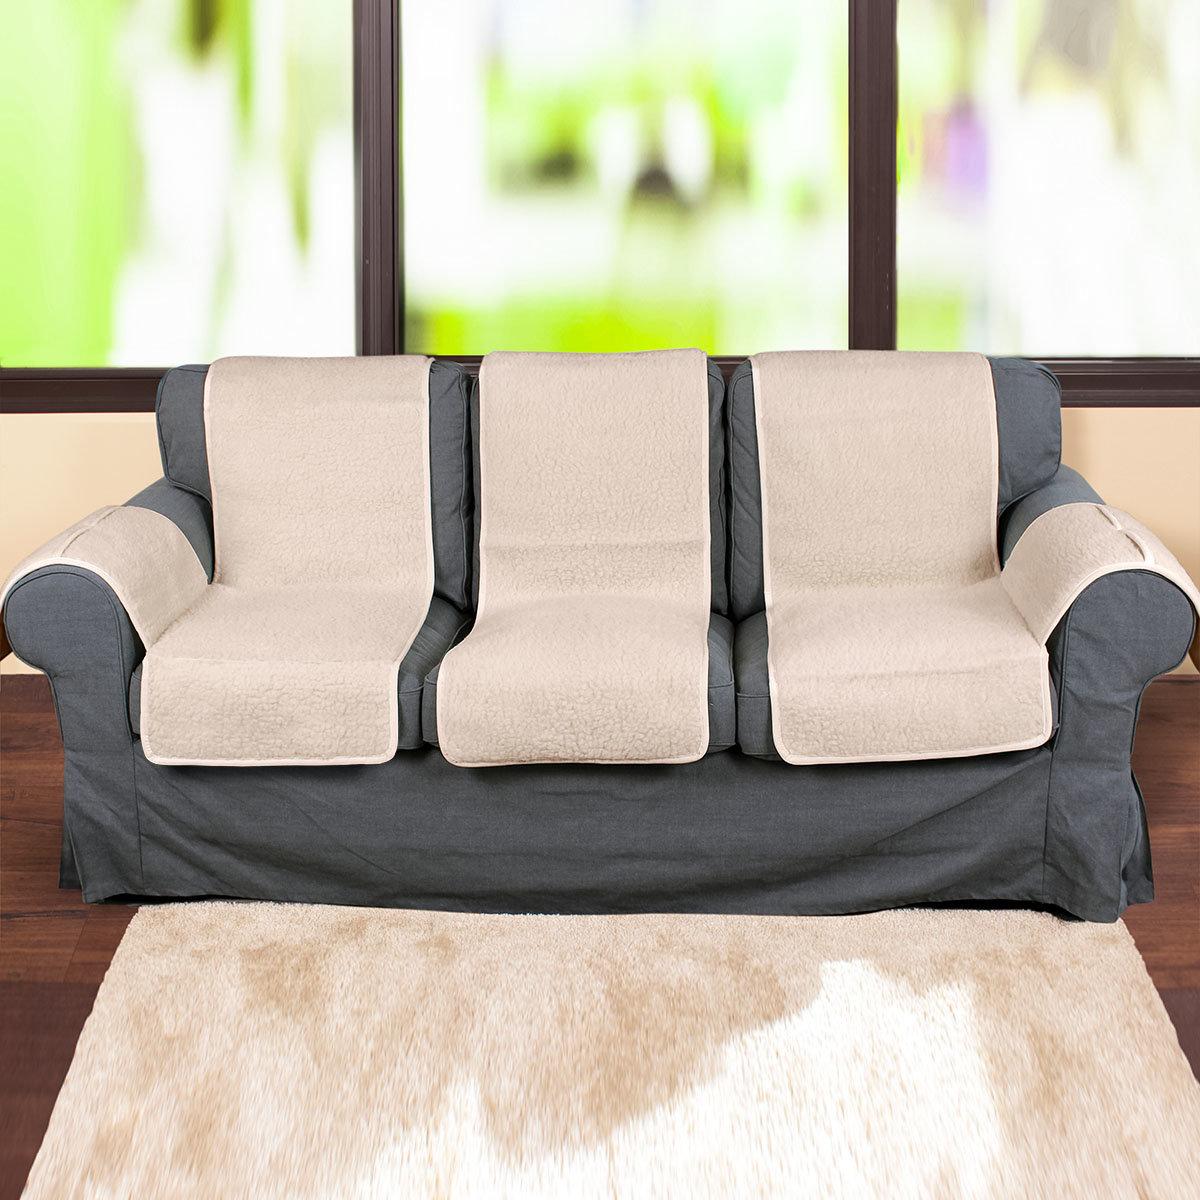 schurwoll schoner gro vaters liebling f r sofas. Black Bedroom Furniture Sets. Home Design Ideas